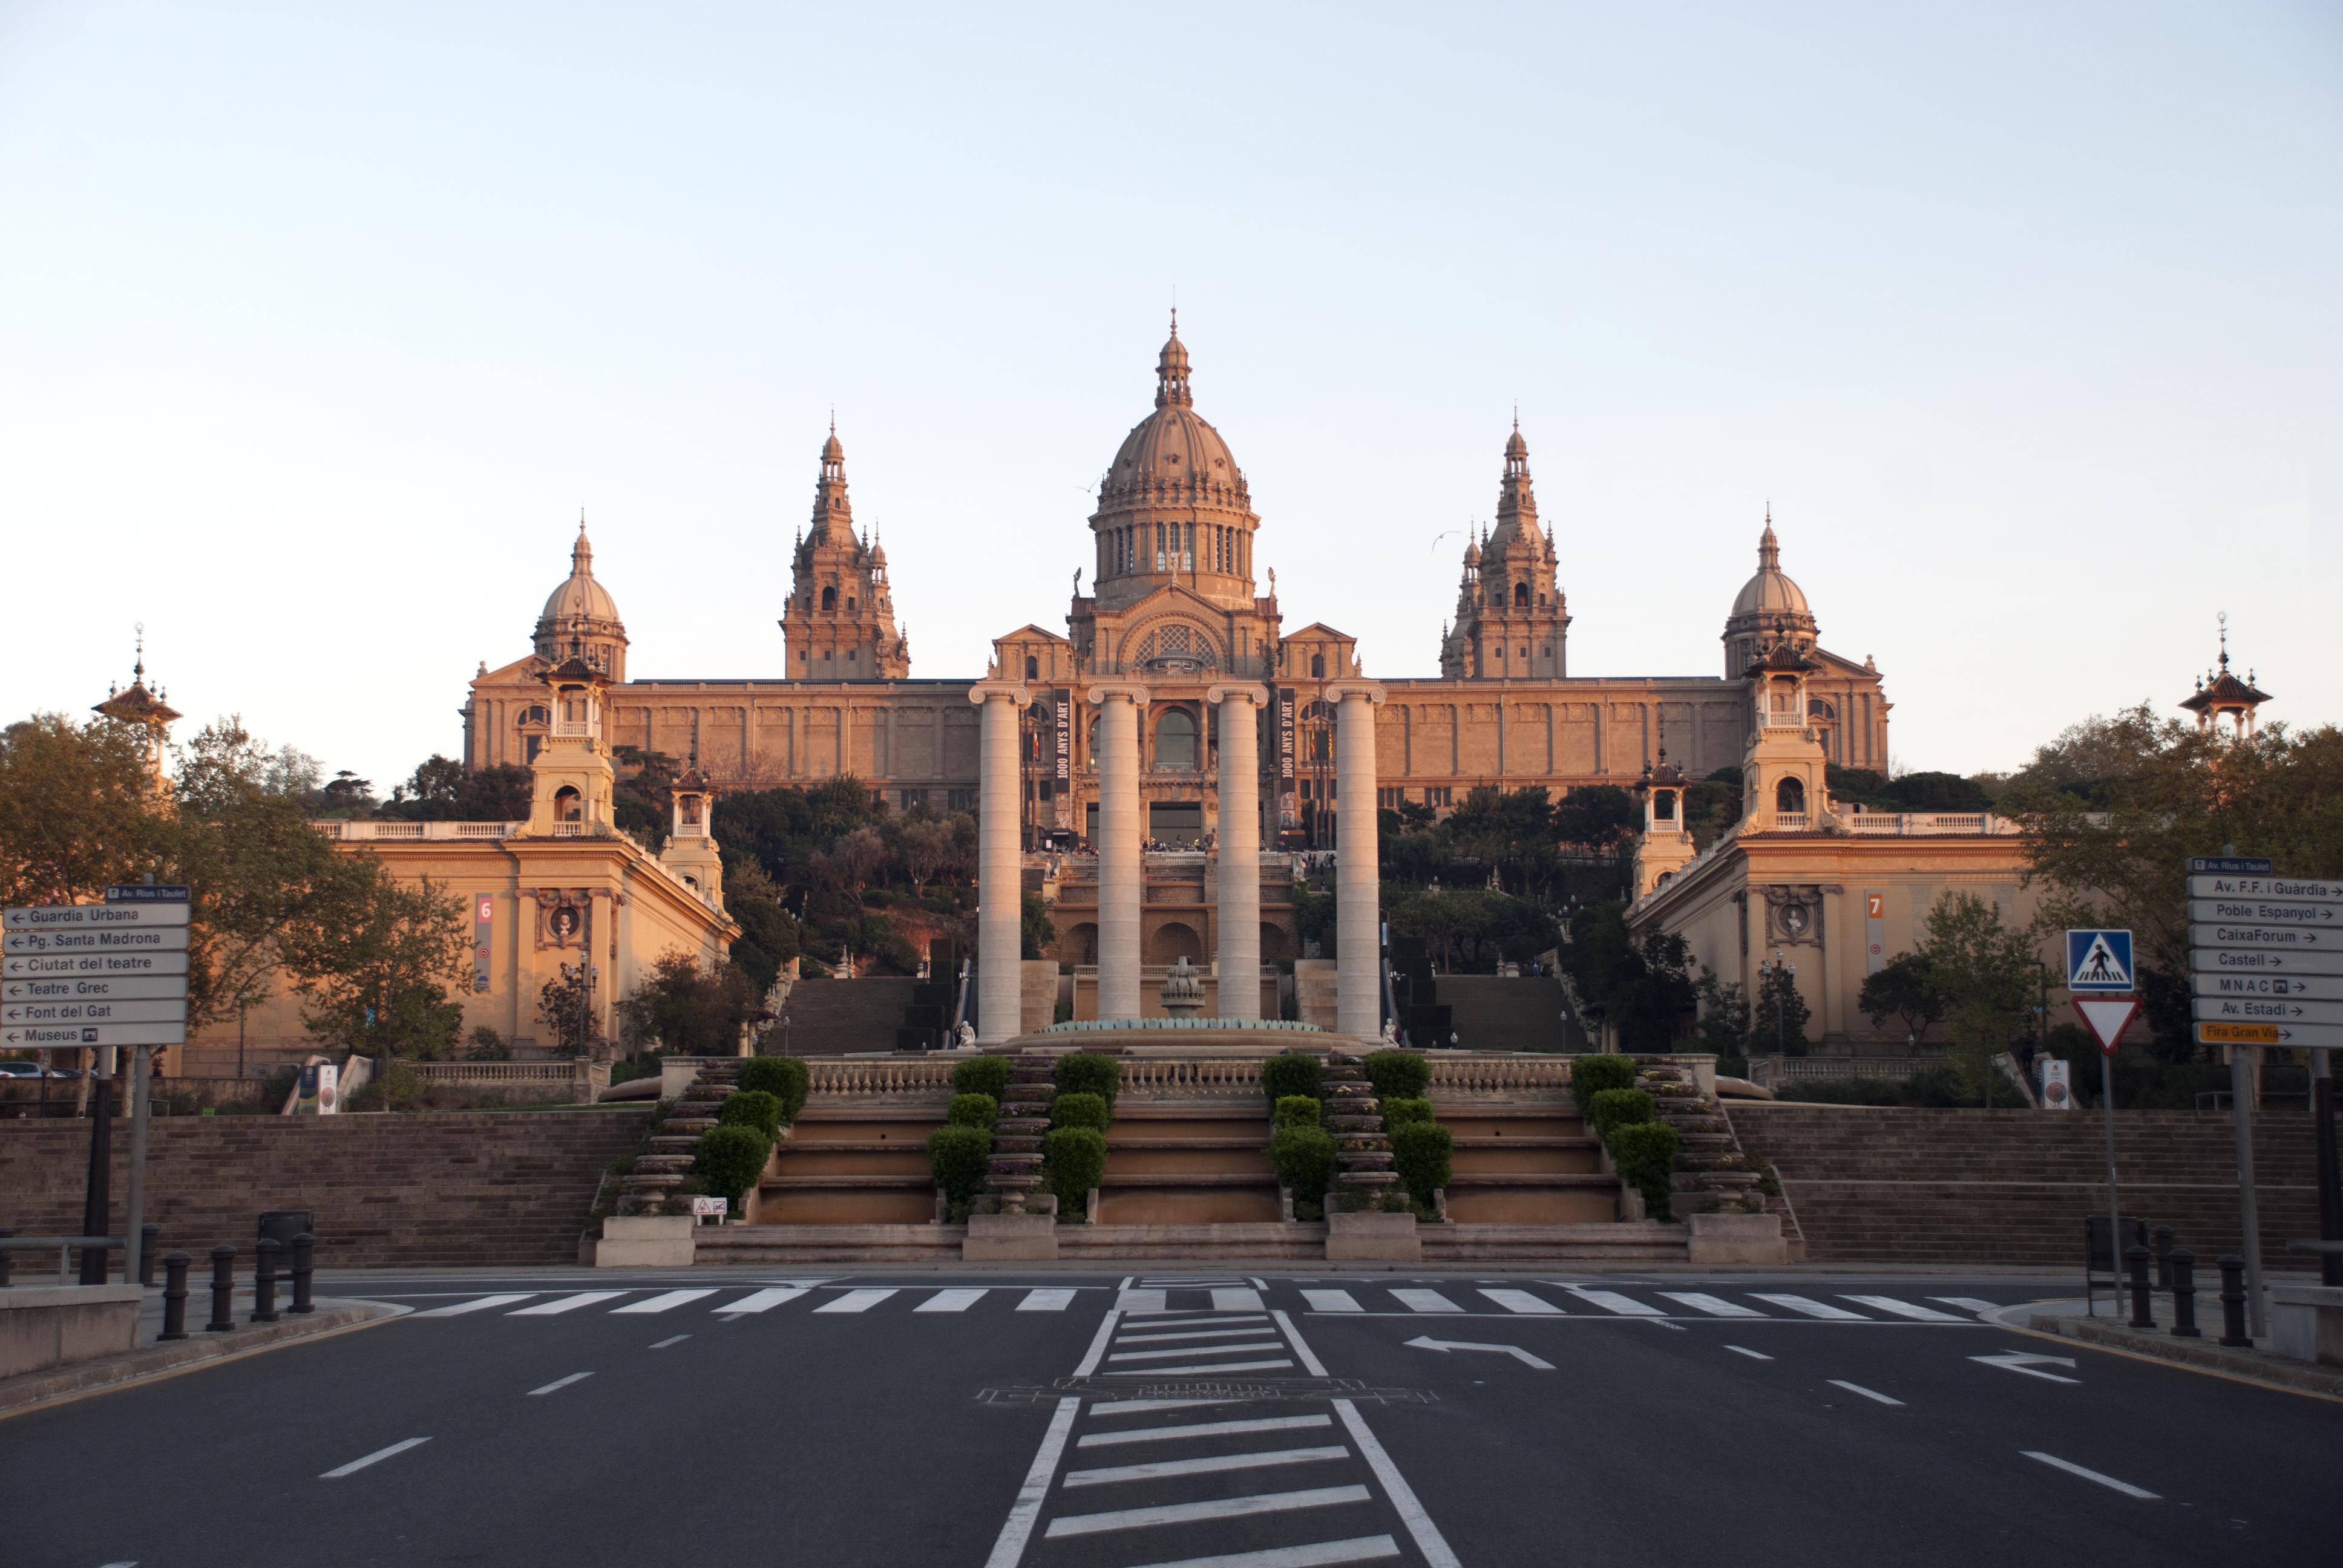 Spain_Catalonia_Barcelona_MontJuic_Puig_i_Cadafalch_Columns